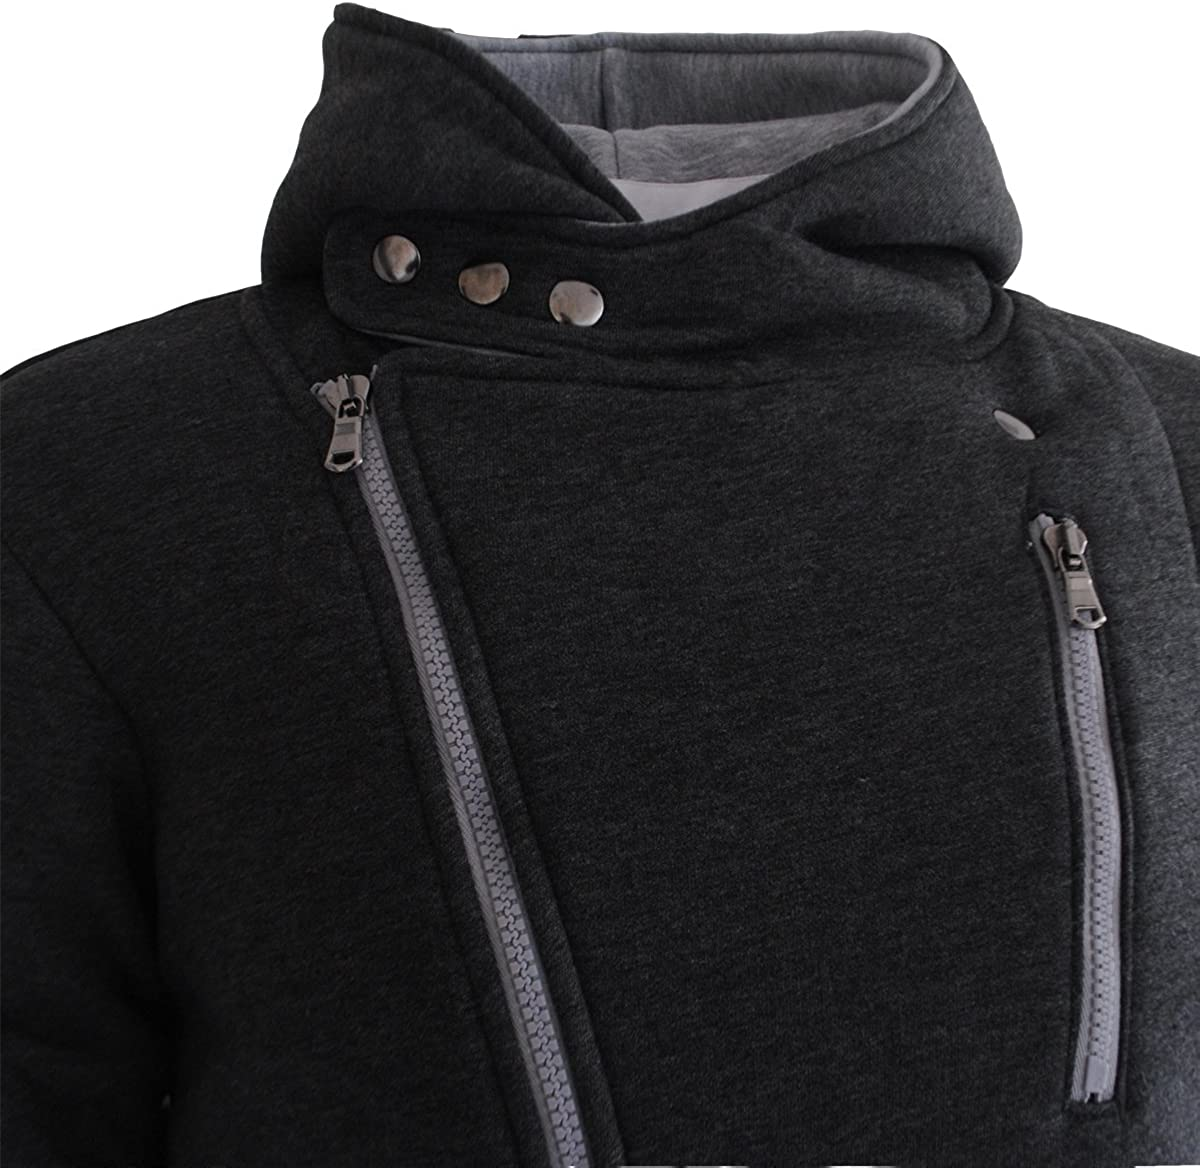 Garcia Pescara Designer Sweatjacke Sweatshirt Hoodie Jacke Anthrazit-grau